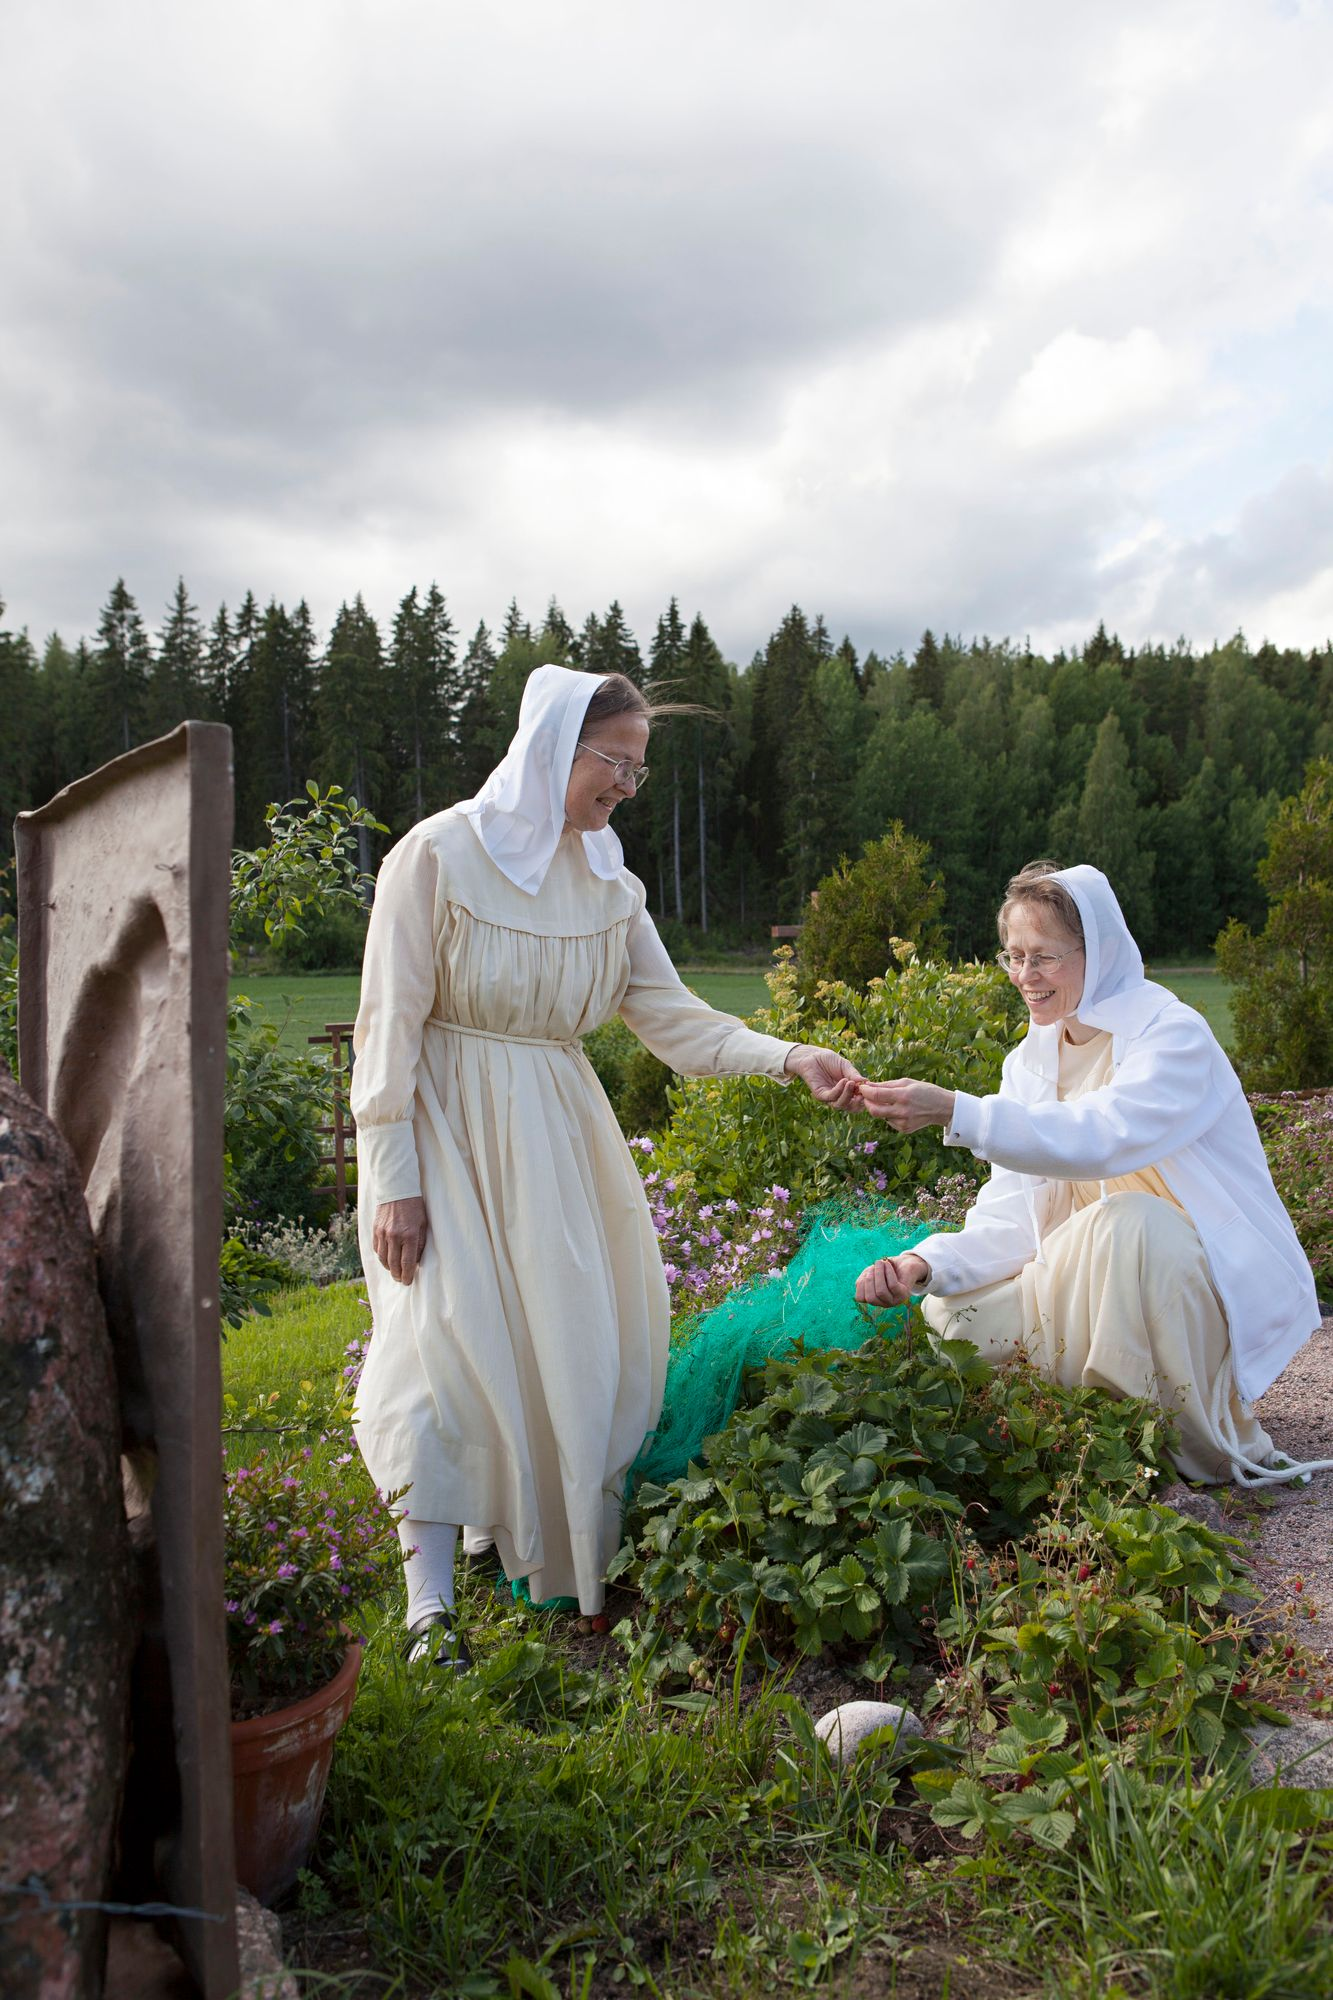 nunnat ja sisar Eugenia ja sisar Pnina